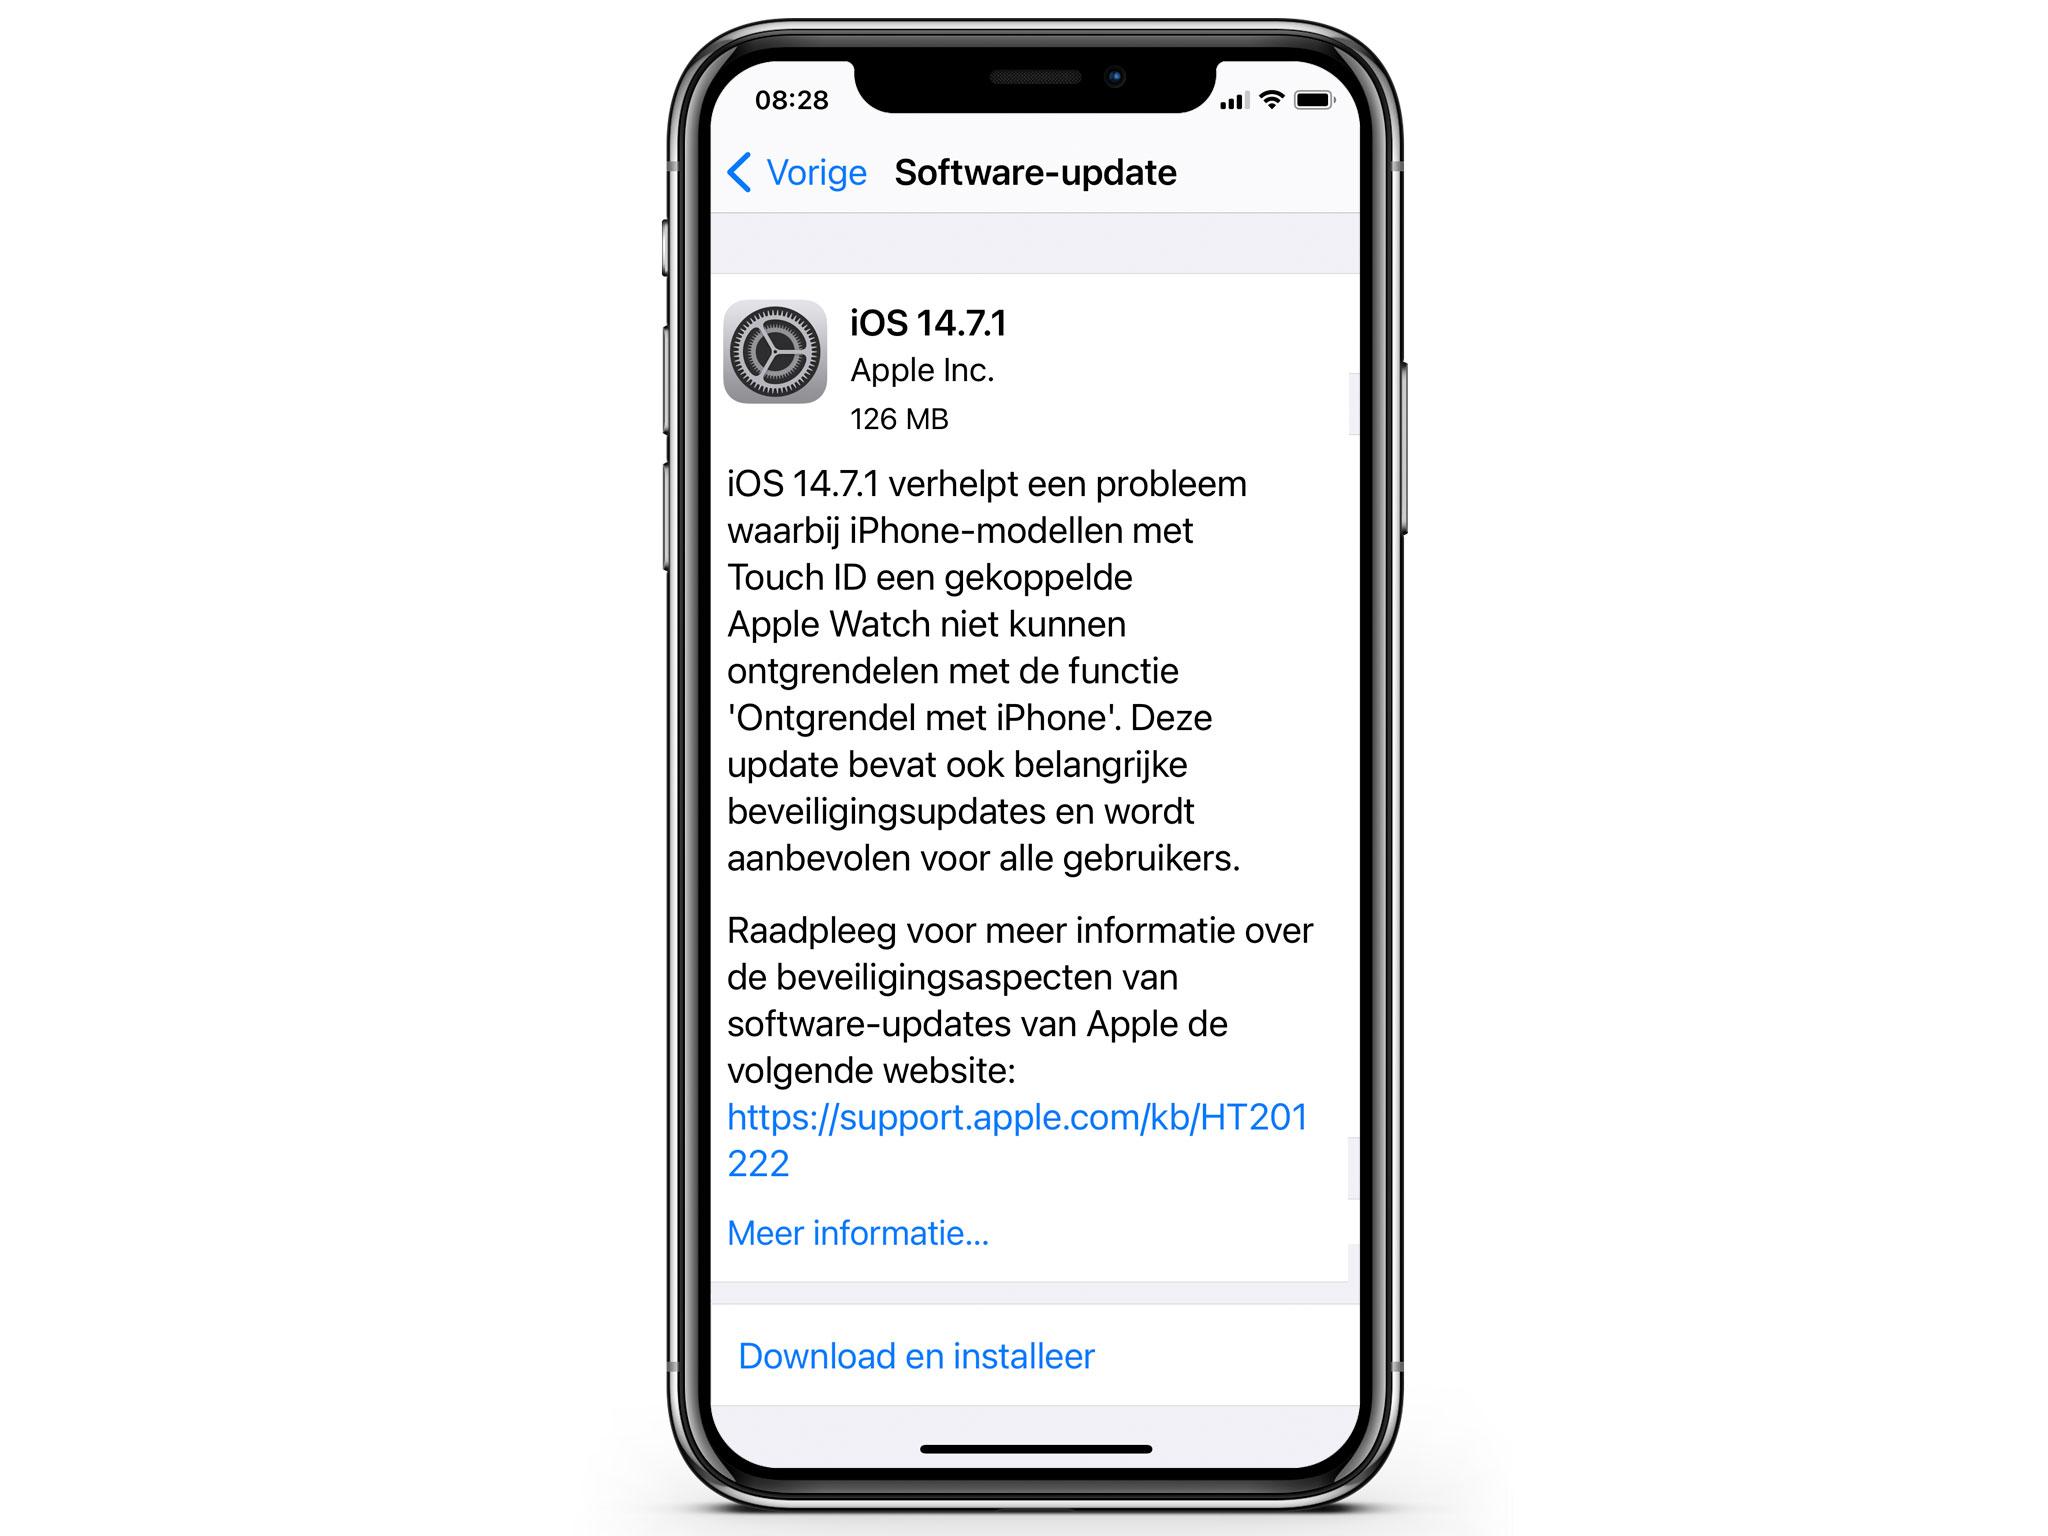 https://www.macfreak.nl/modules/news/images/zArt.iPhone14.7.1ReleaseNotes.jpg